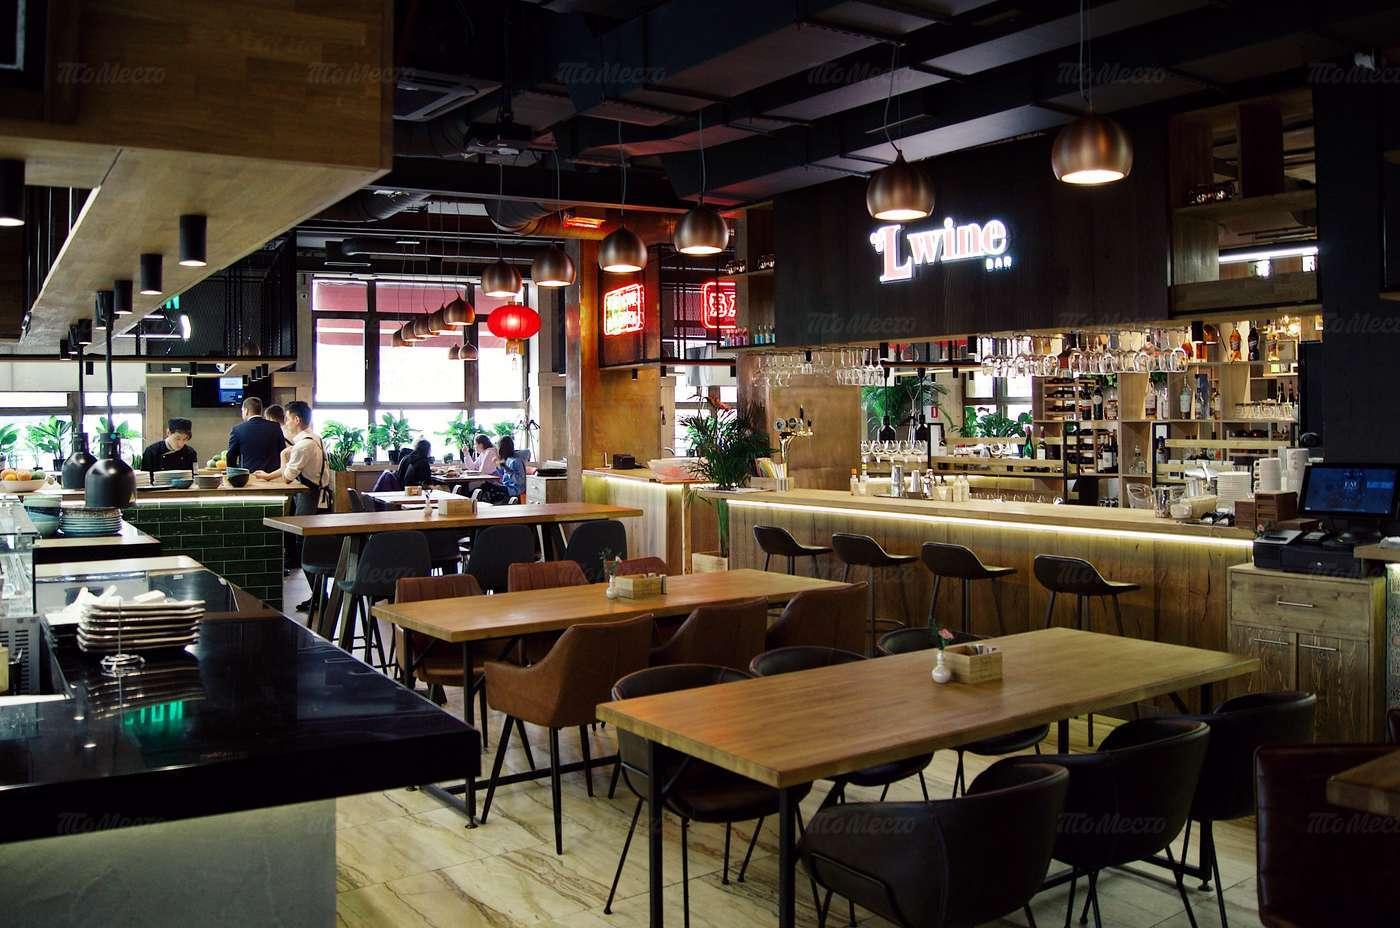 Ресторан Kvartal Daily Bistro (Квартал) на улице Маршала Рыбалко фото 4